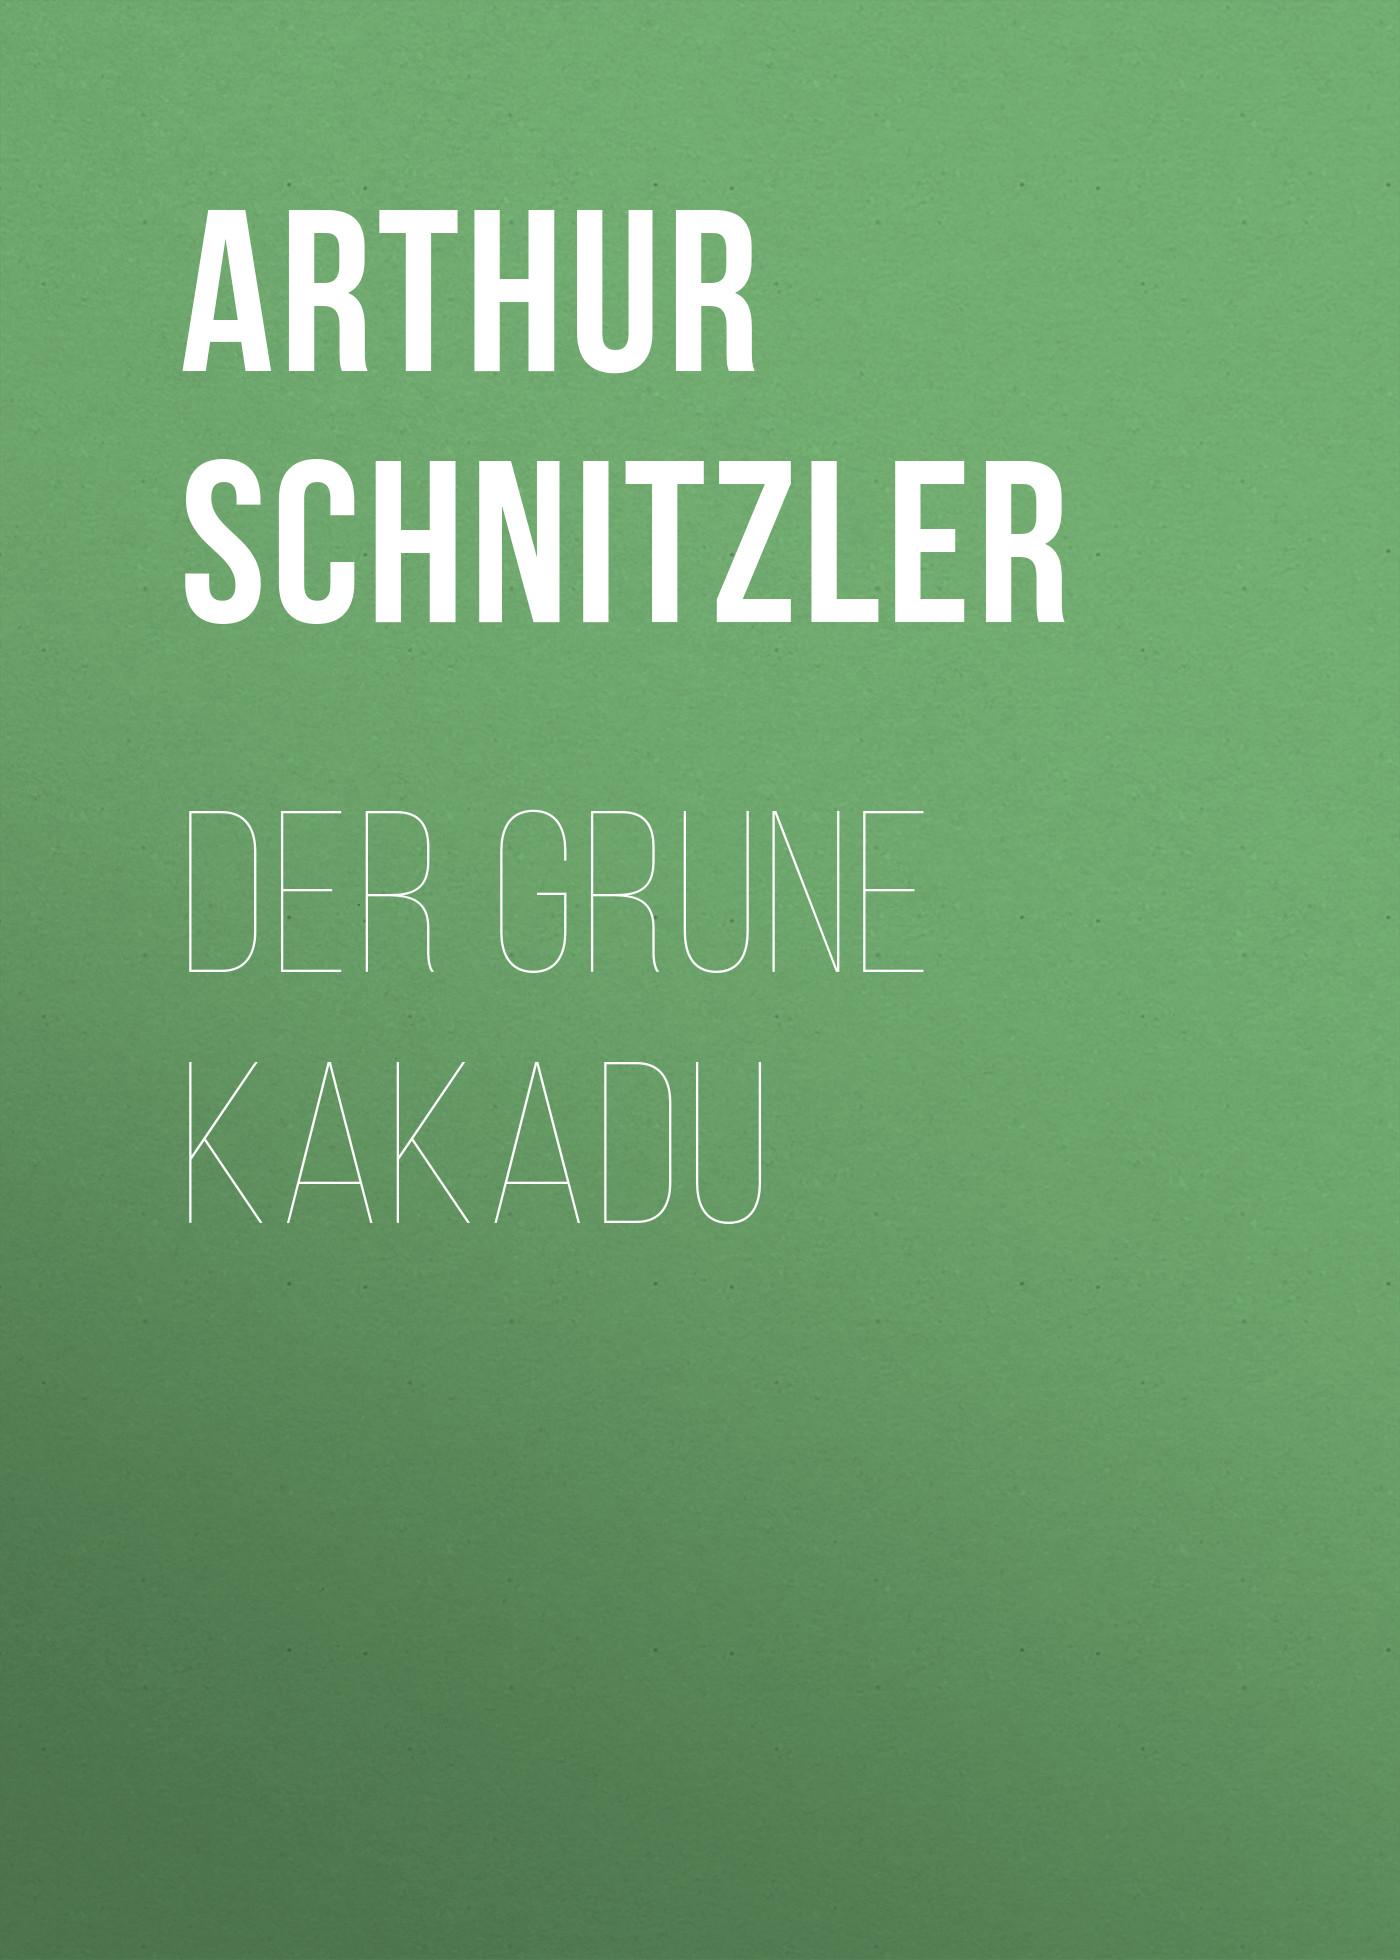 Arthur Schnitzler Der grune Kakadu